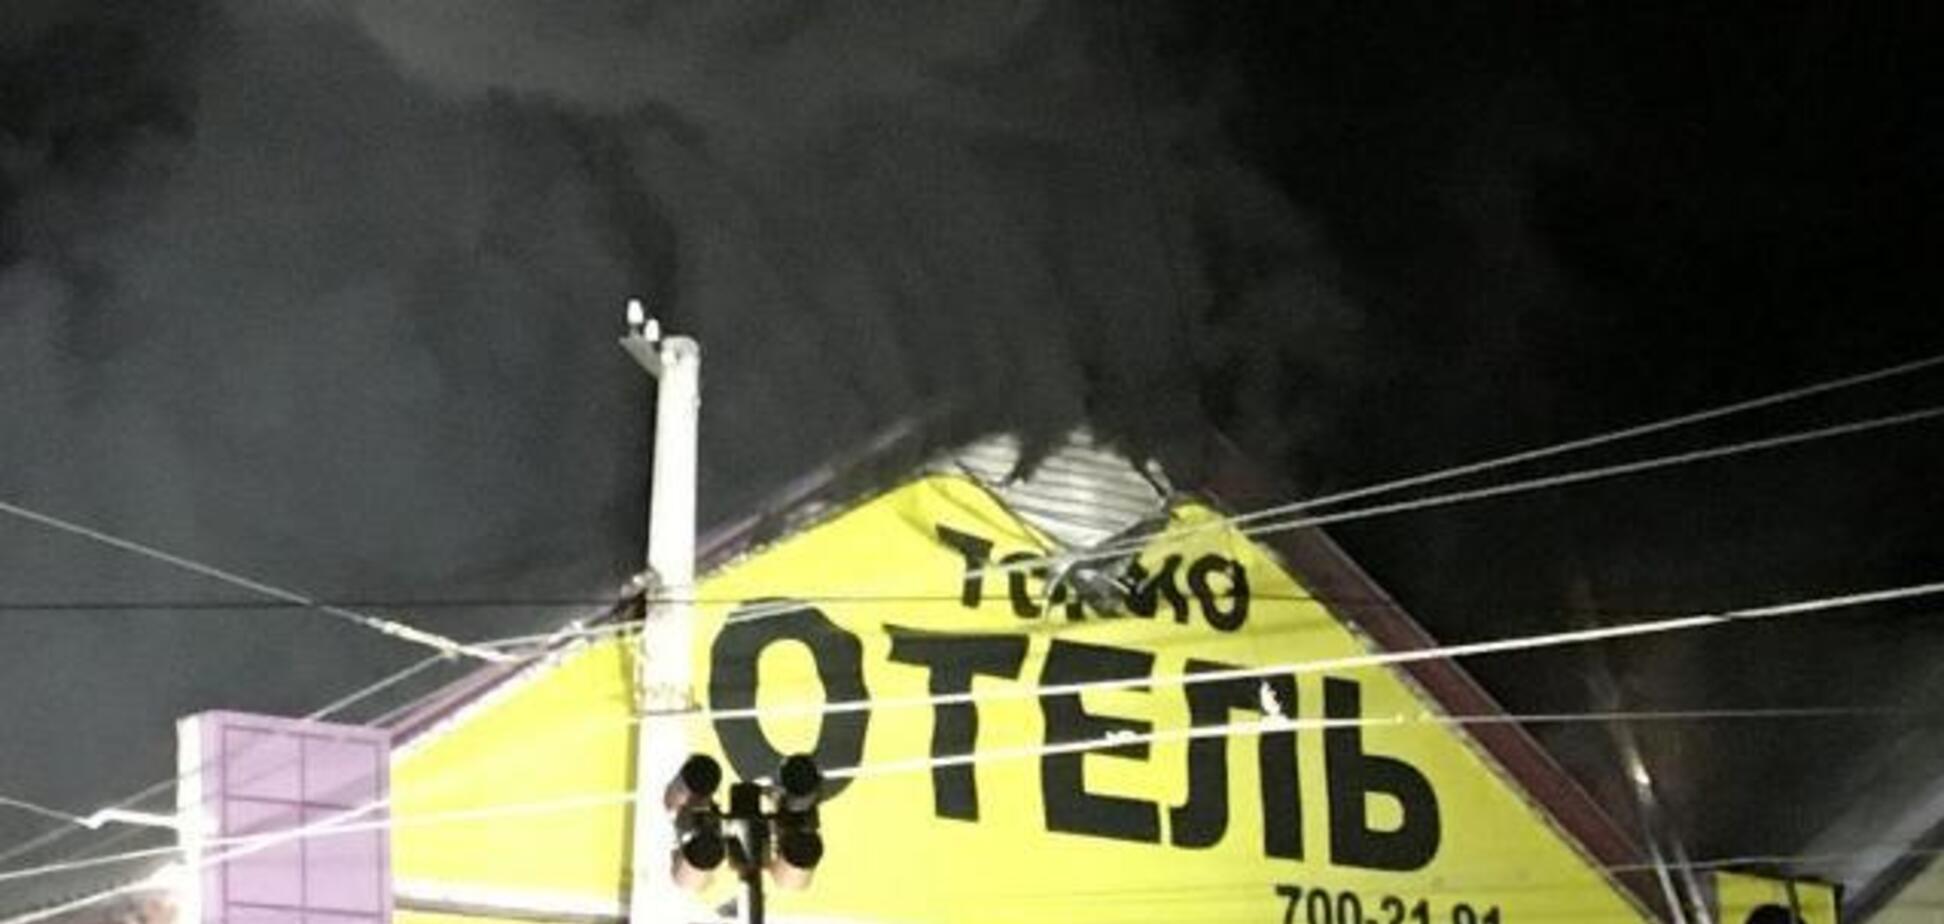 Моторошна пожежа в готелі Одеси: з'явилося лякаюче фото зсередини